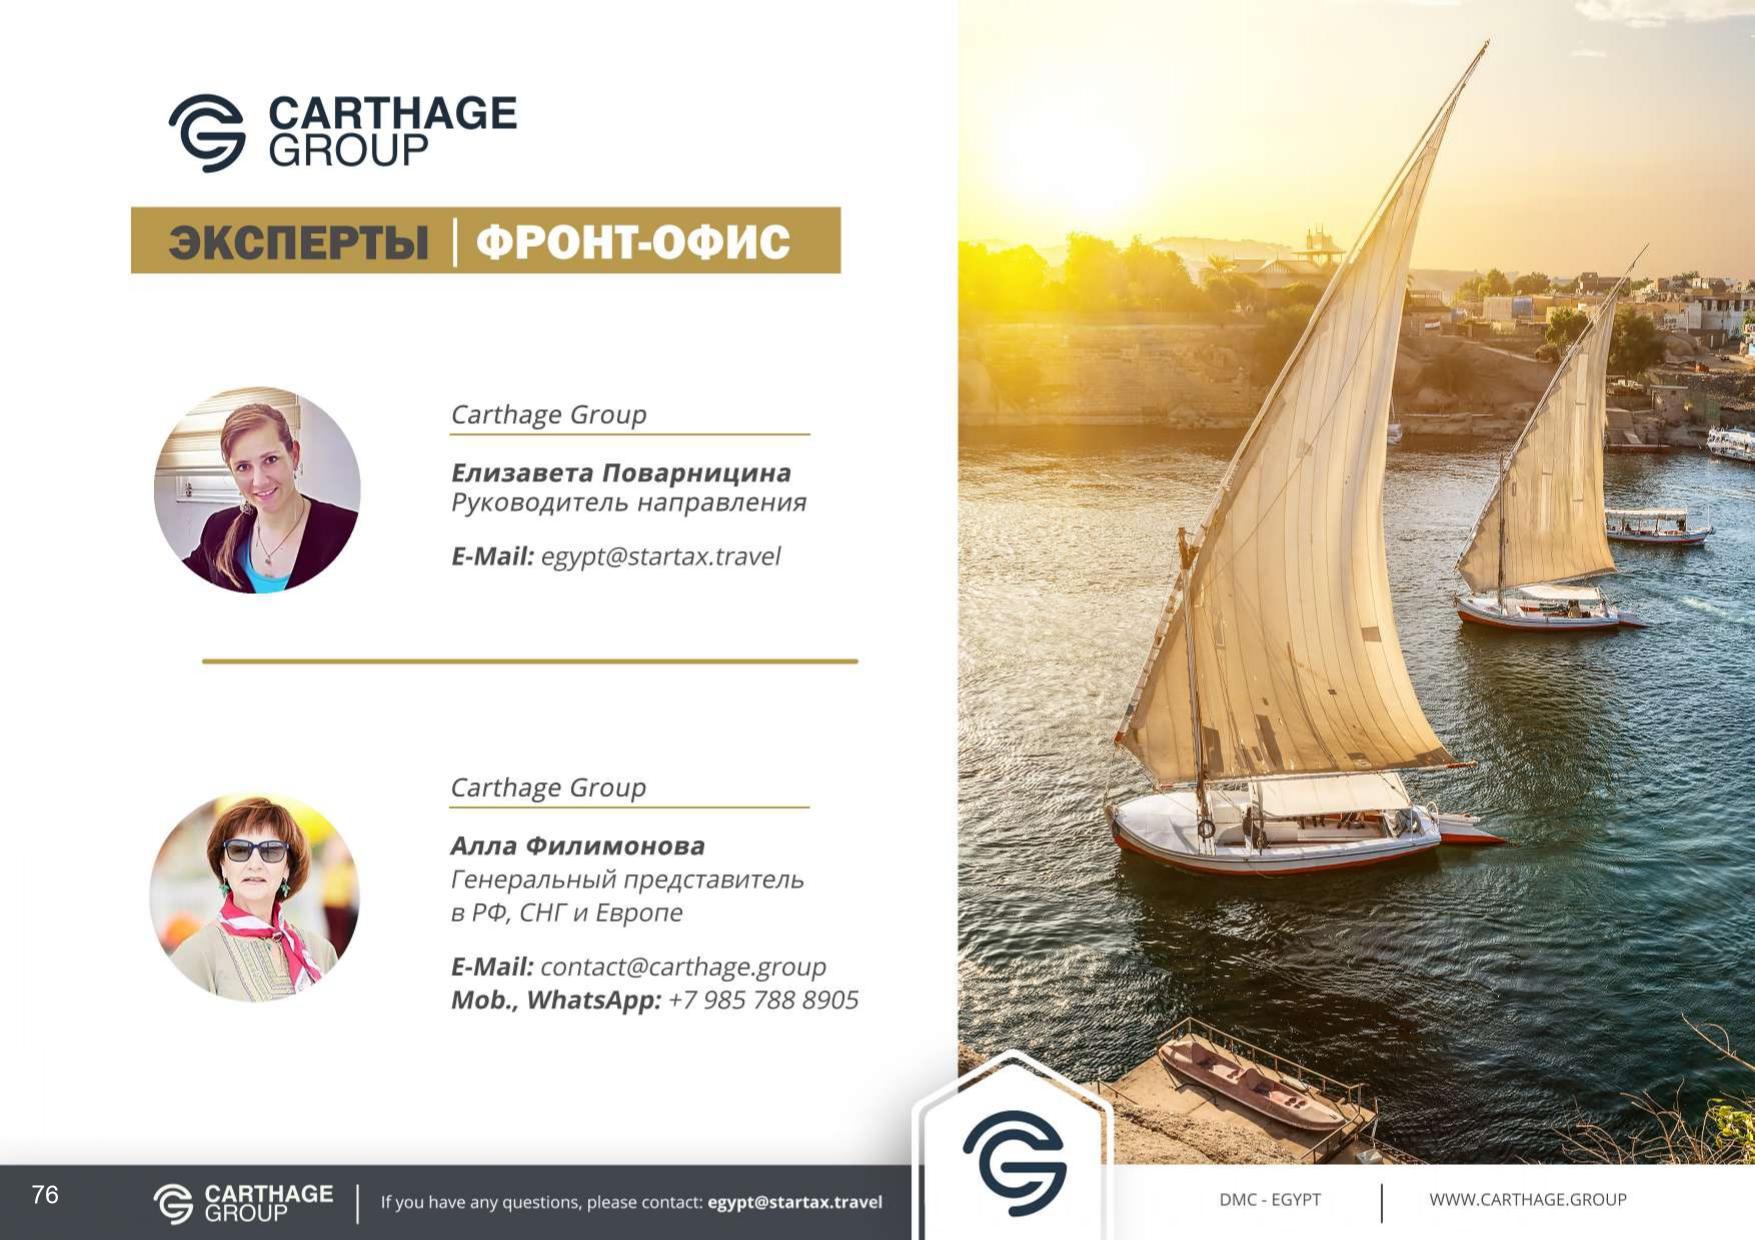 Картаж_Египет_2021-сылки_page-0076